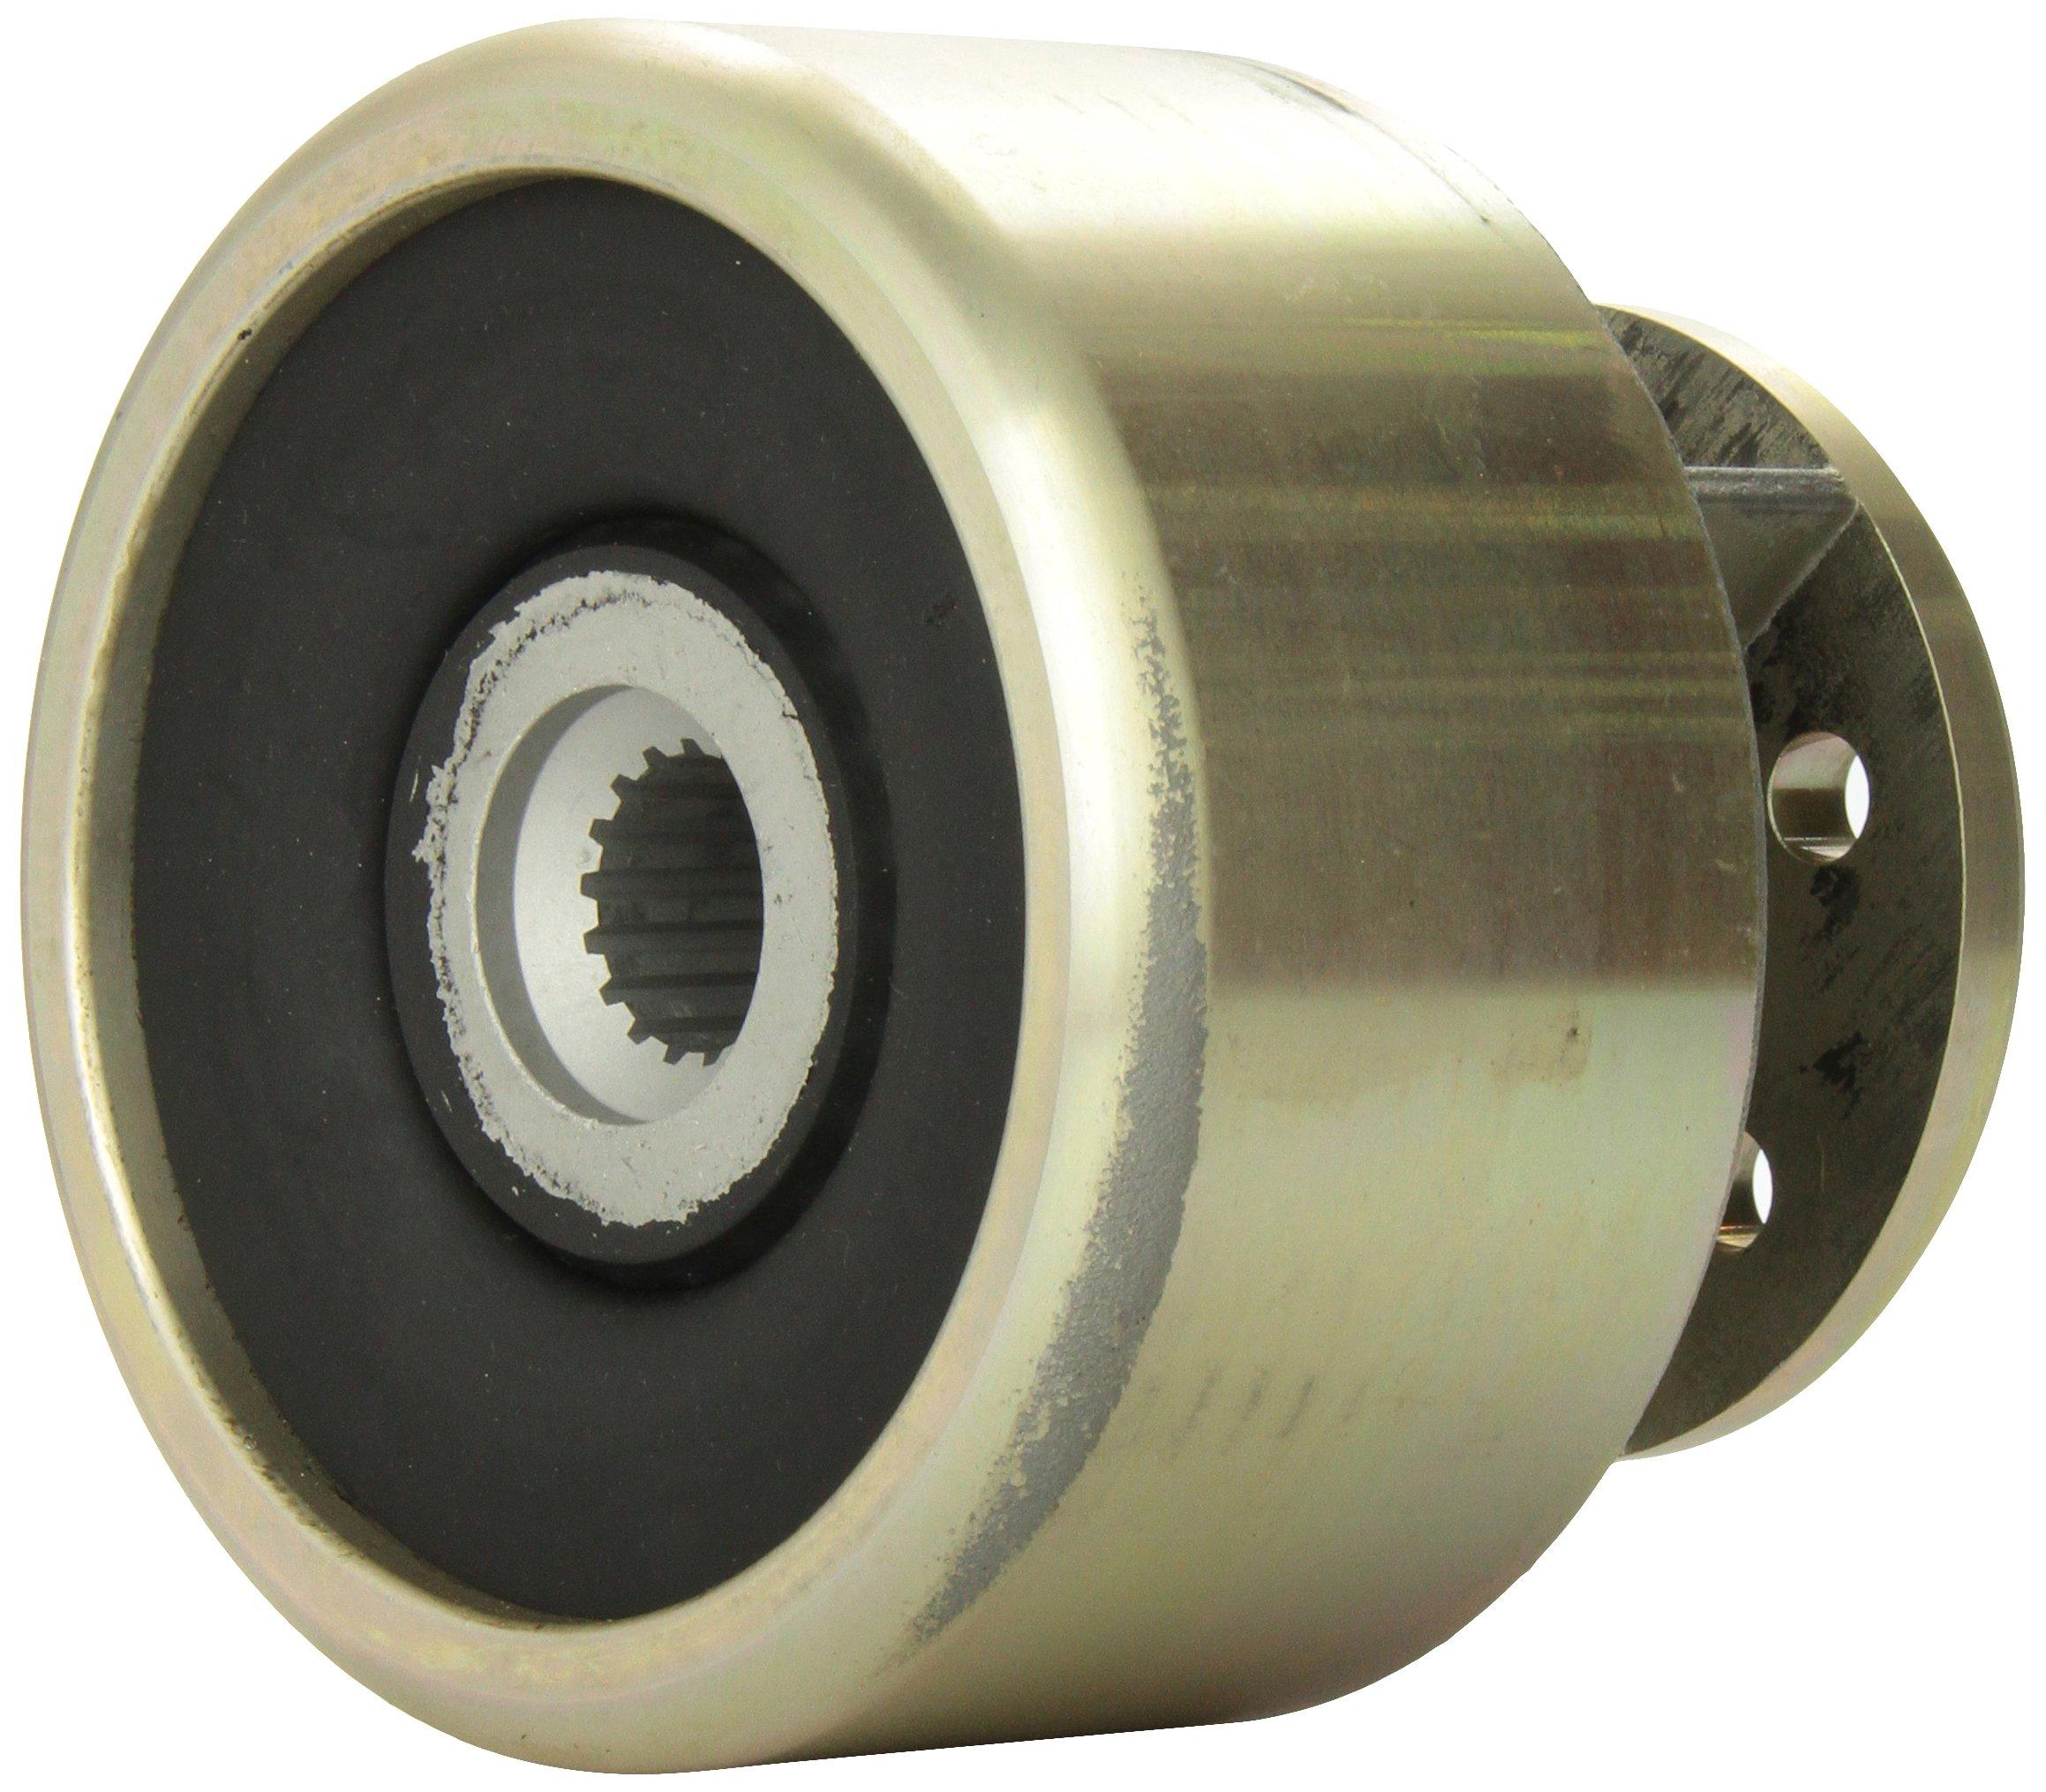 Sierra International 18-21752-1 Marine Engine Coupler